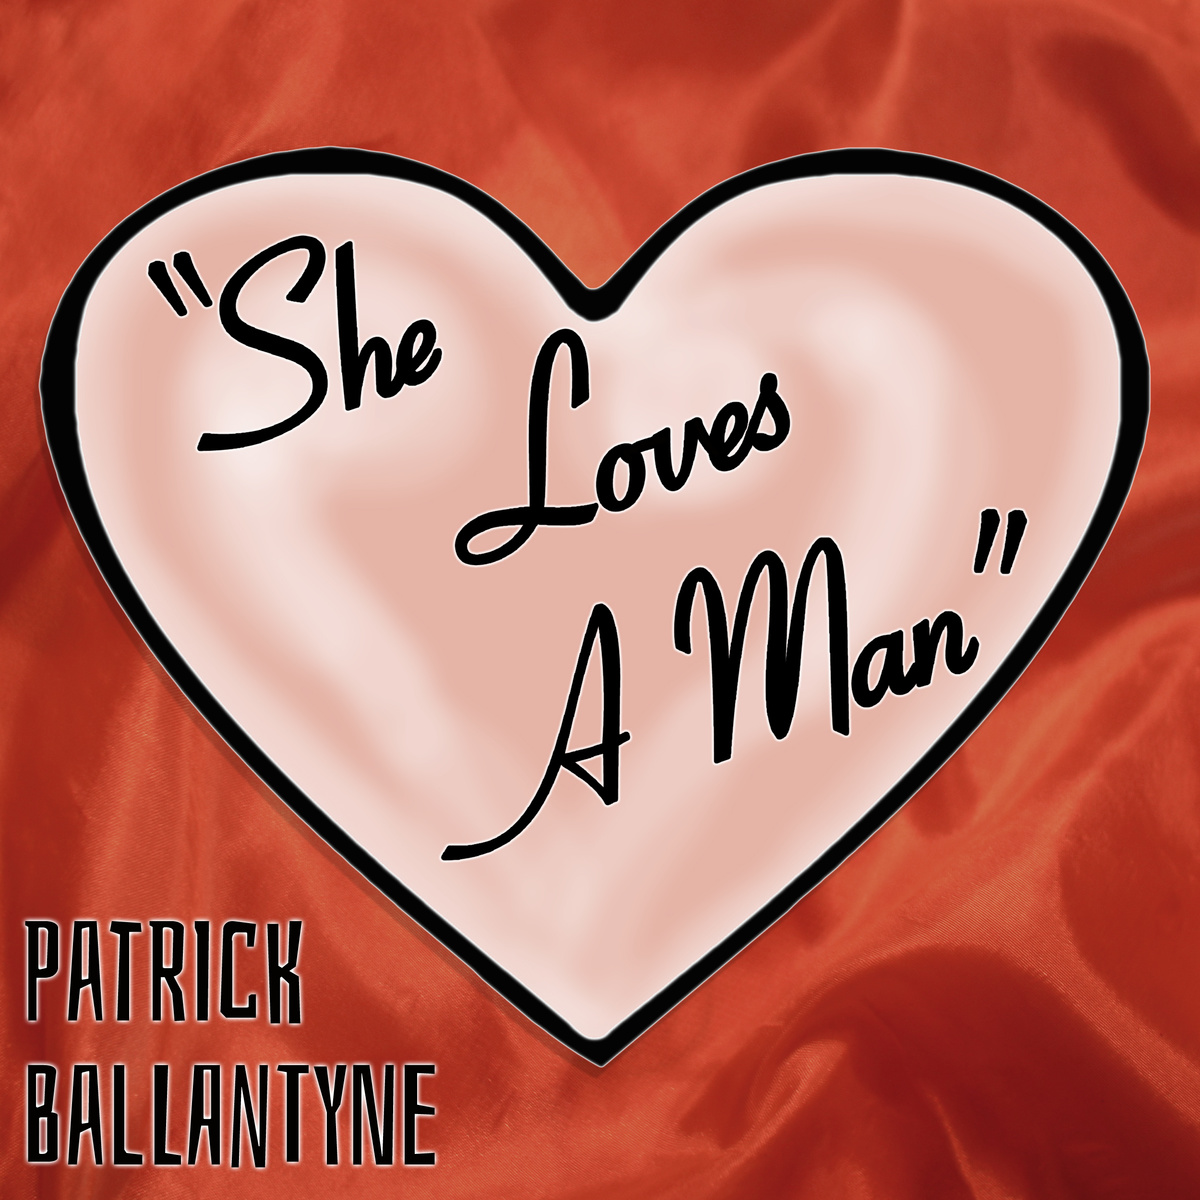 A Ballantyne Valentine